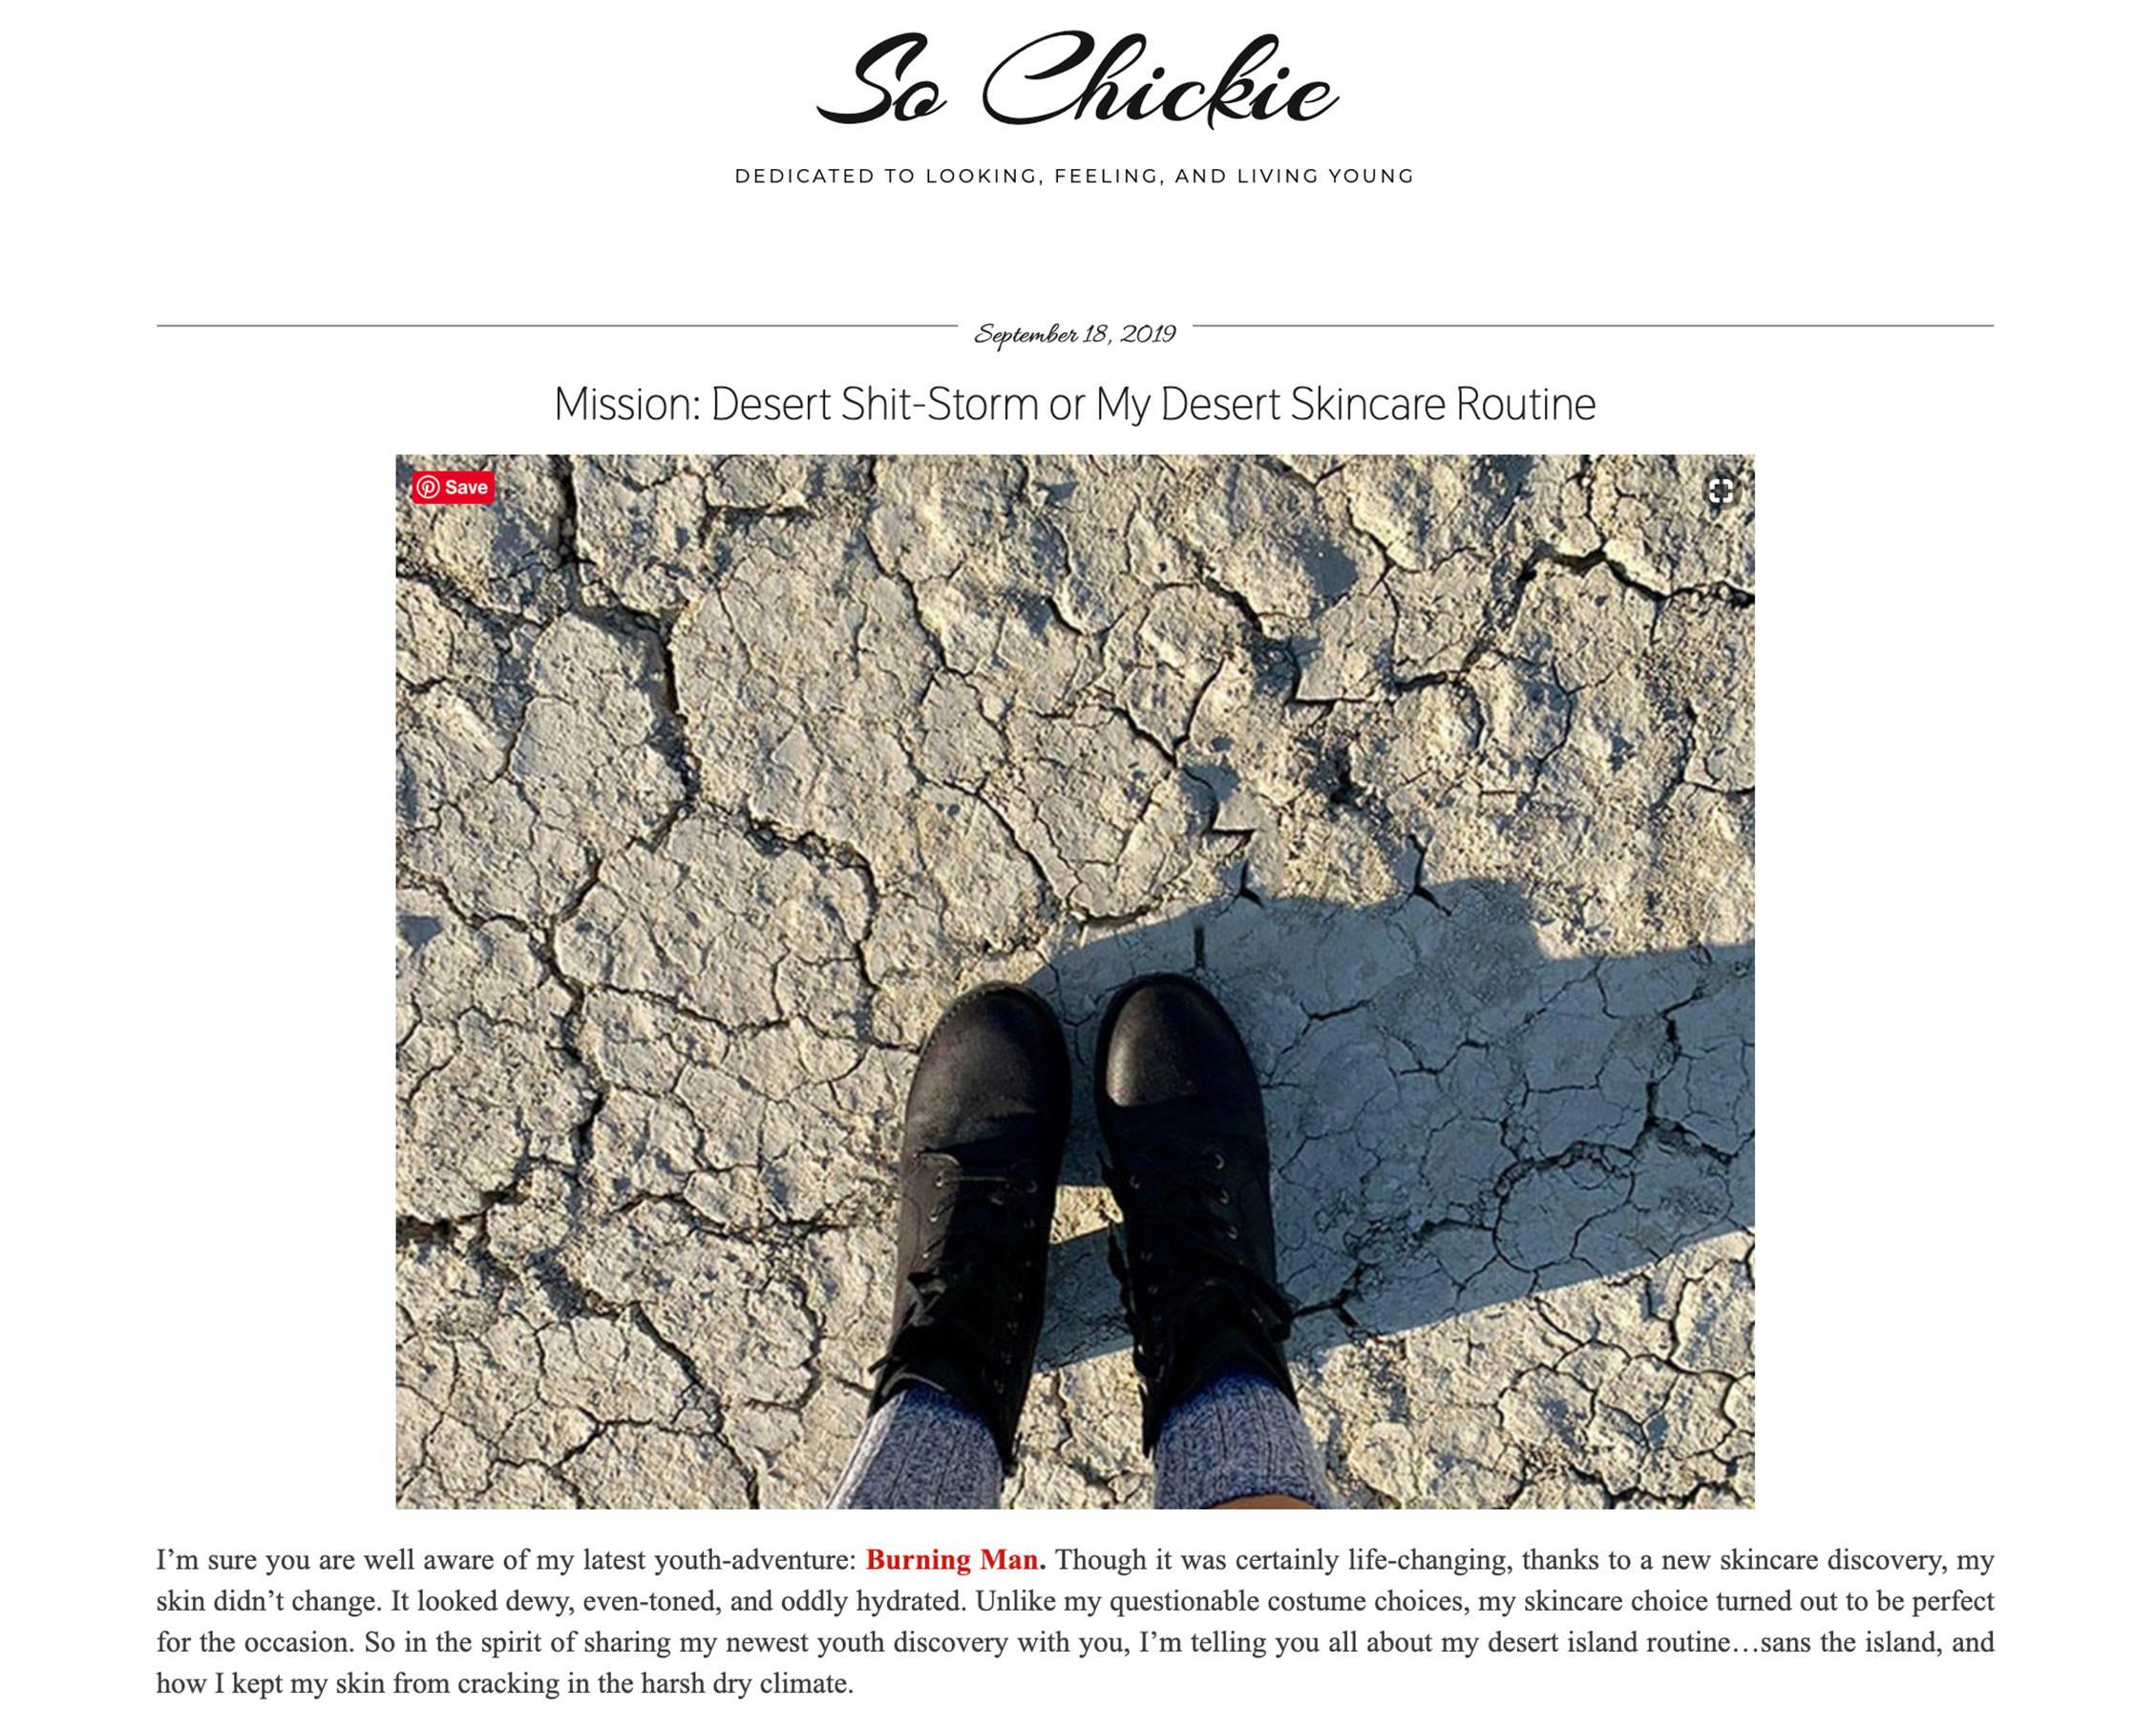 Sochickie.com Blog post about Mikel Kristi Skincare